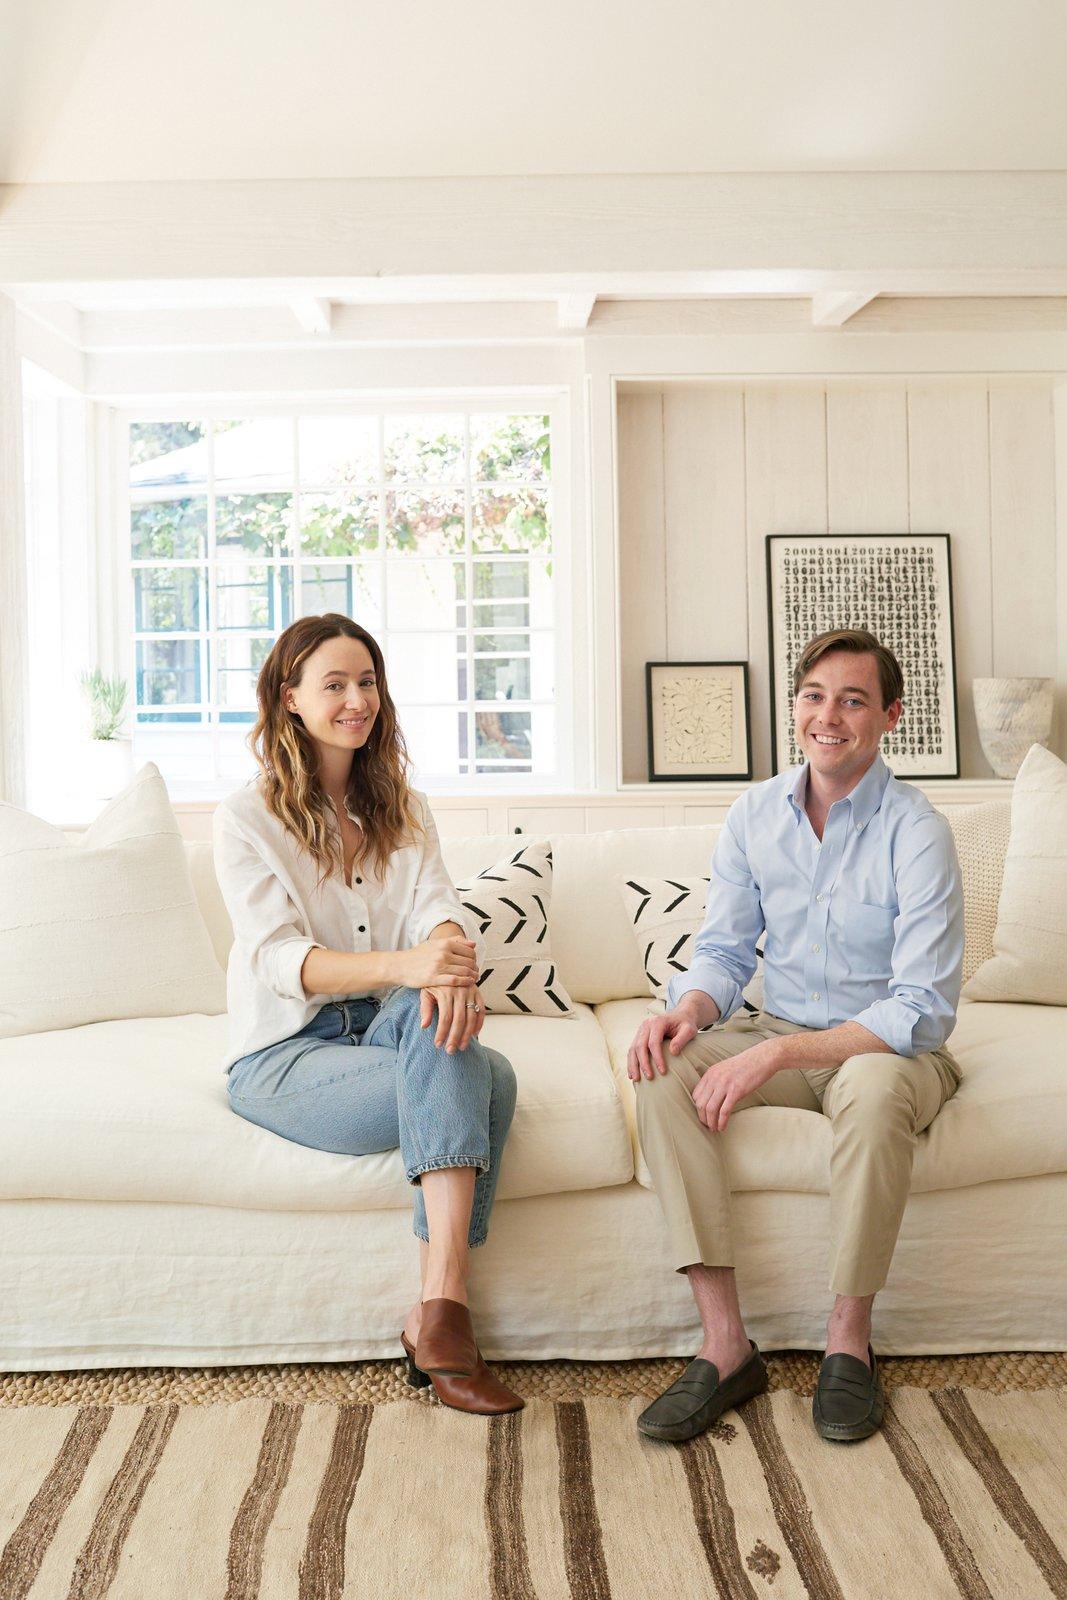 Photo 8 of 21 in Inside Jenni Kayne's Stunning Living Room Makeover